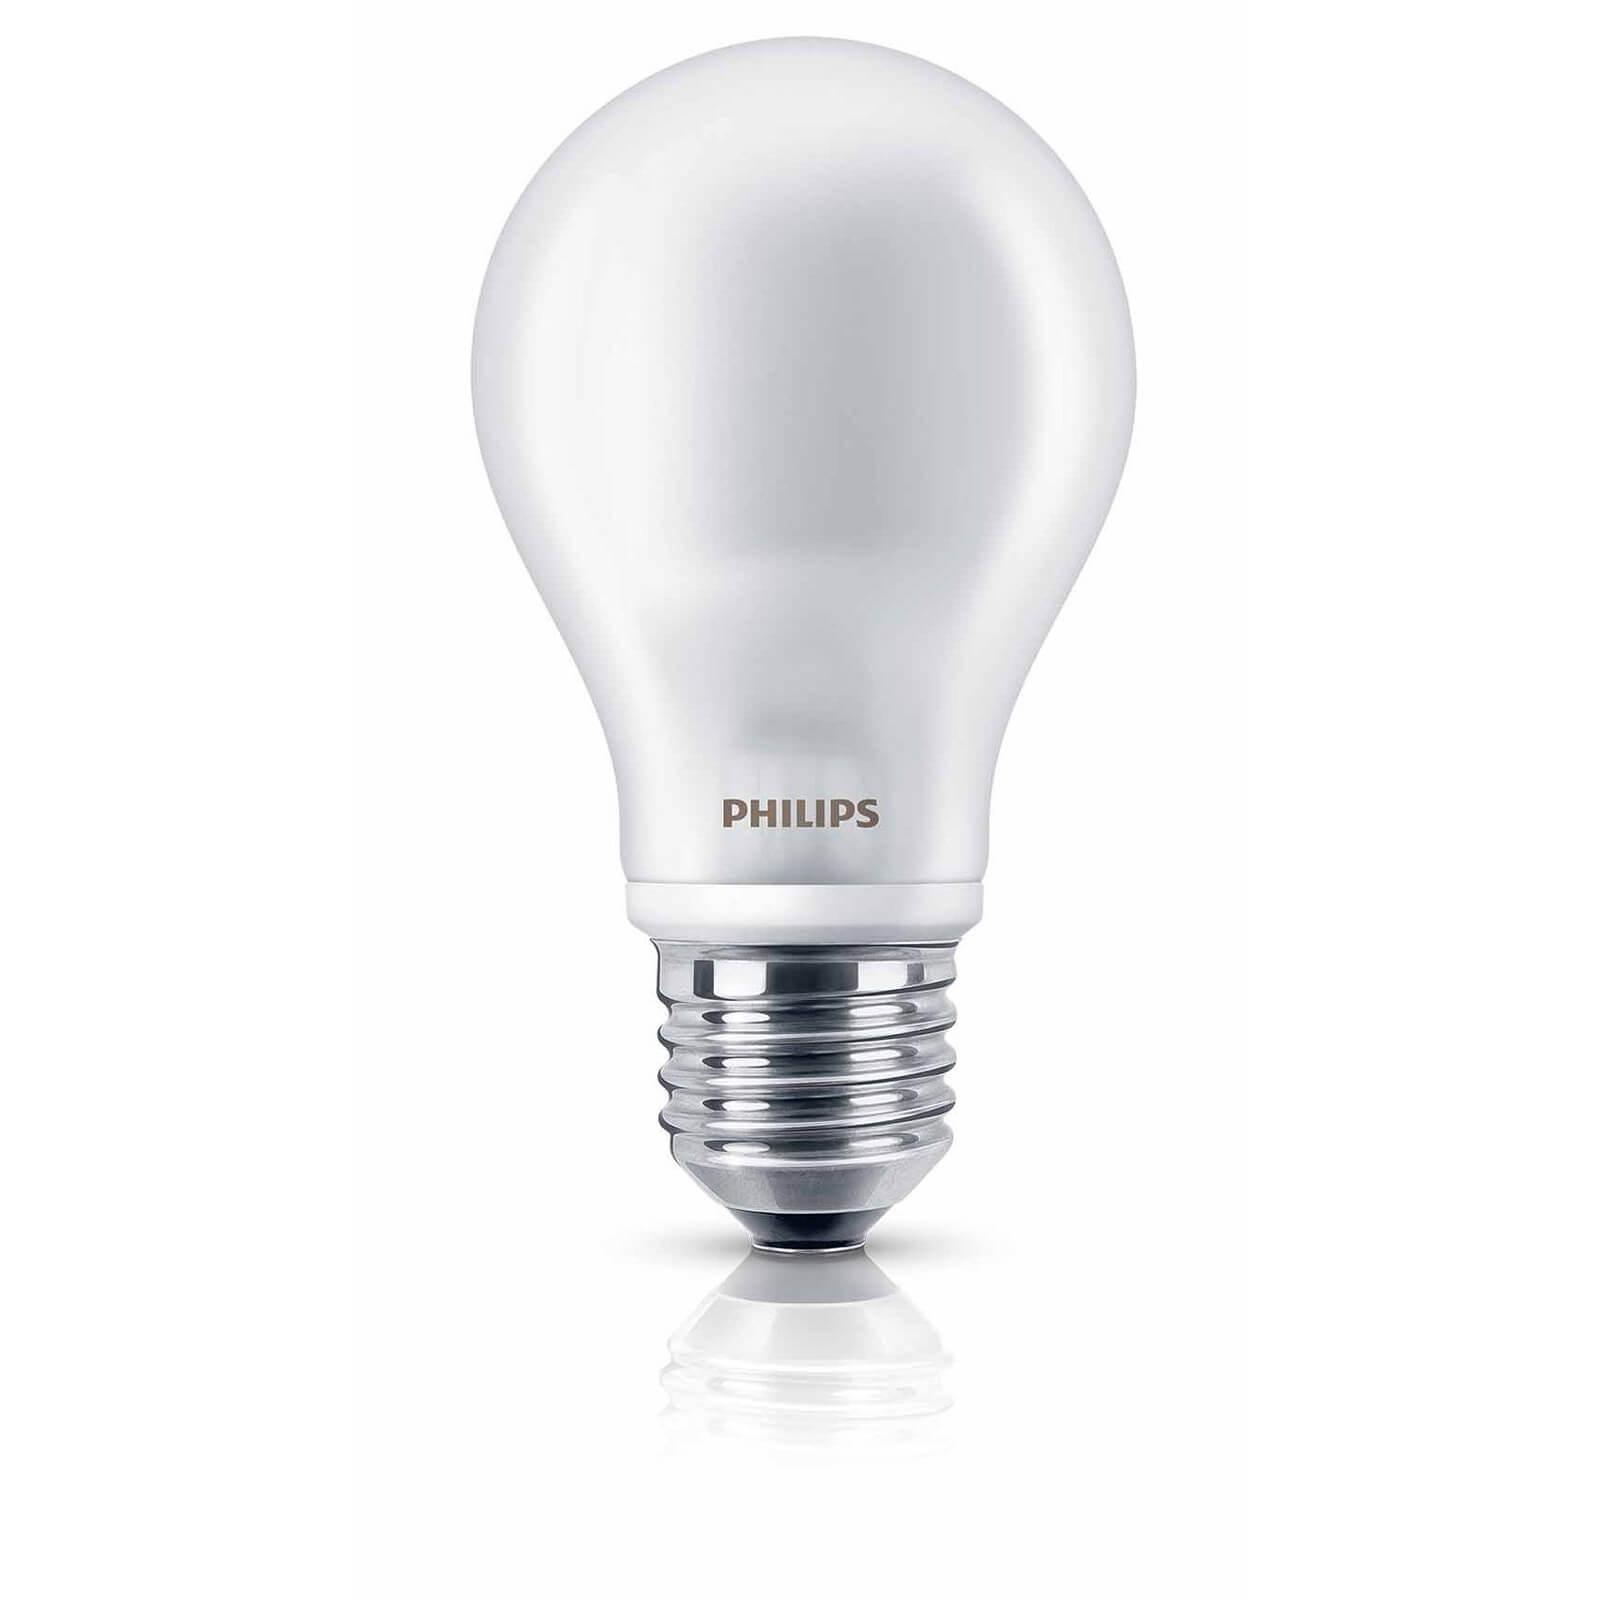 philips led lamp classic 40w e27. Black Bedroom Furniture Sets. Home Design Ideas